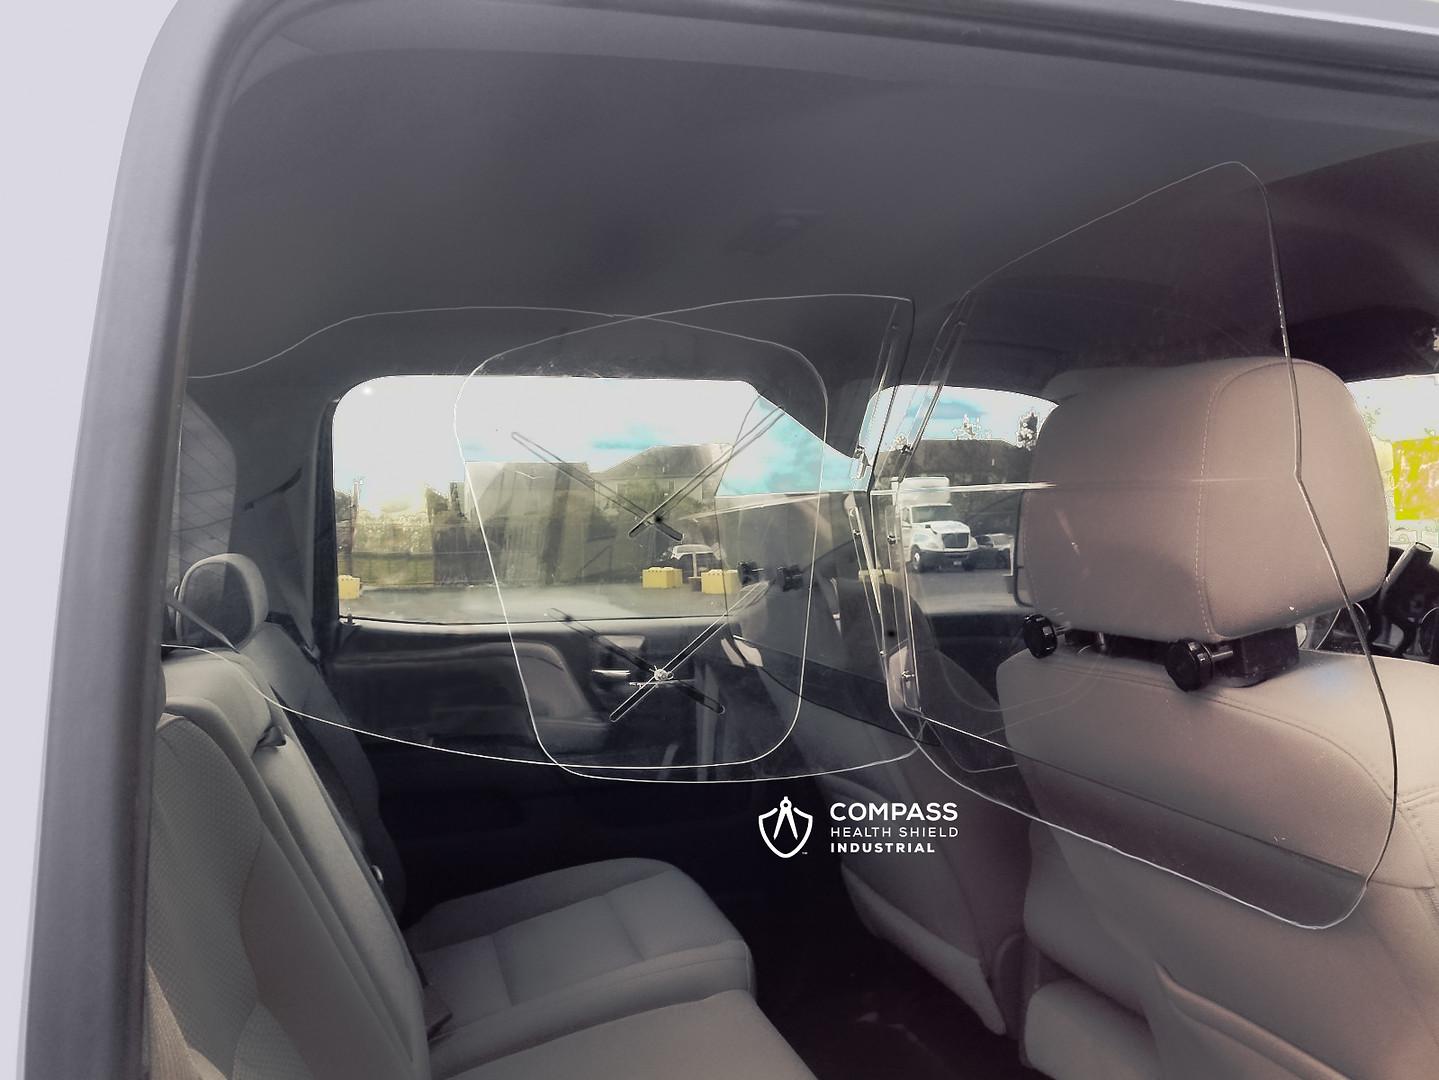 2020_09_15 F150 rear seat view 2.jpg